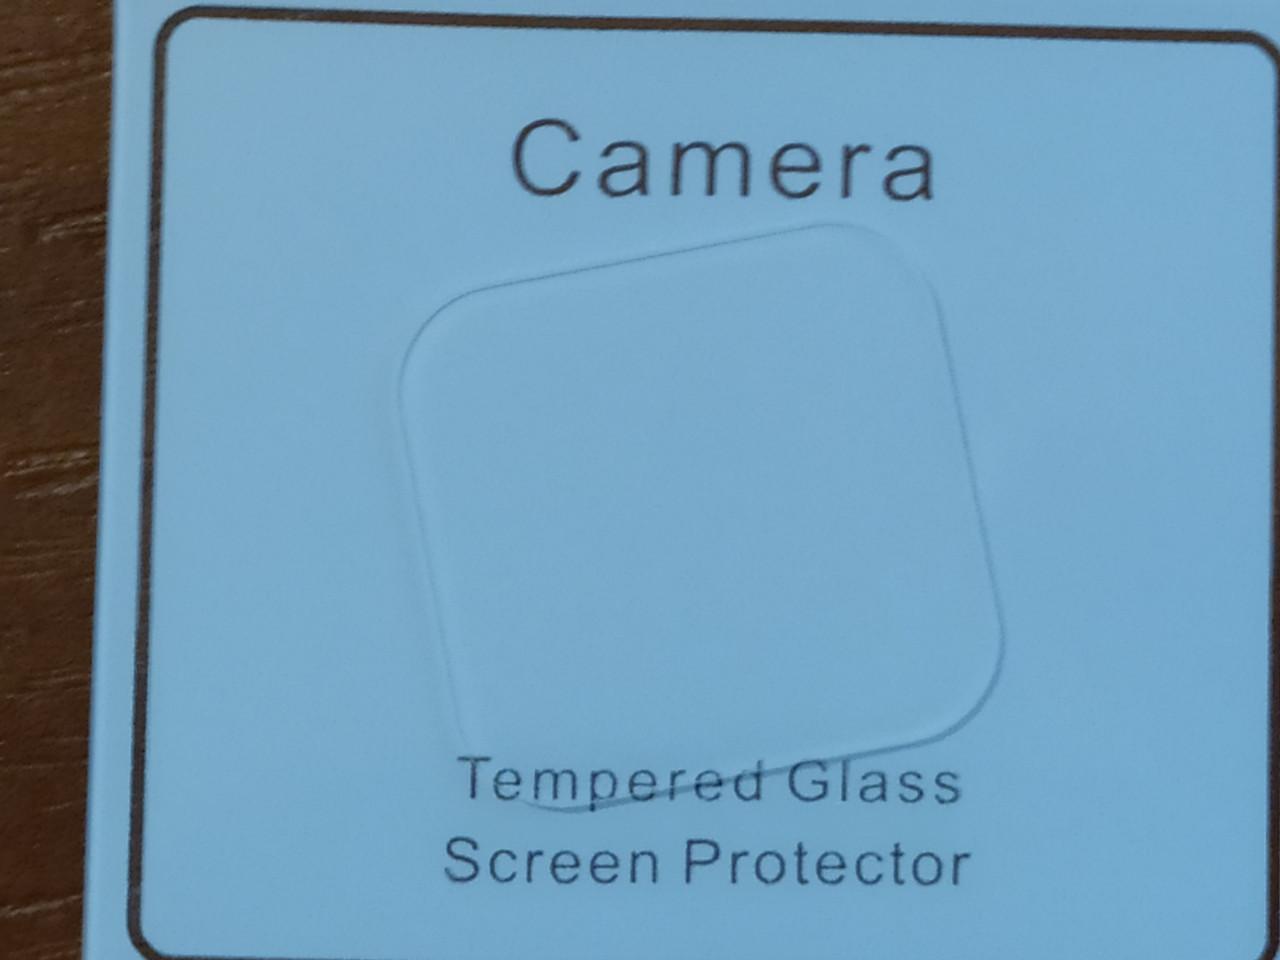 Защитное стекло на камеру Tempered Glass Screen Protector  Xiaomi Redmi Note 9 Pro / Note 9s